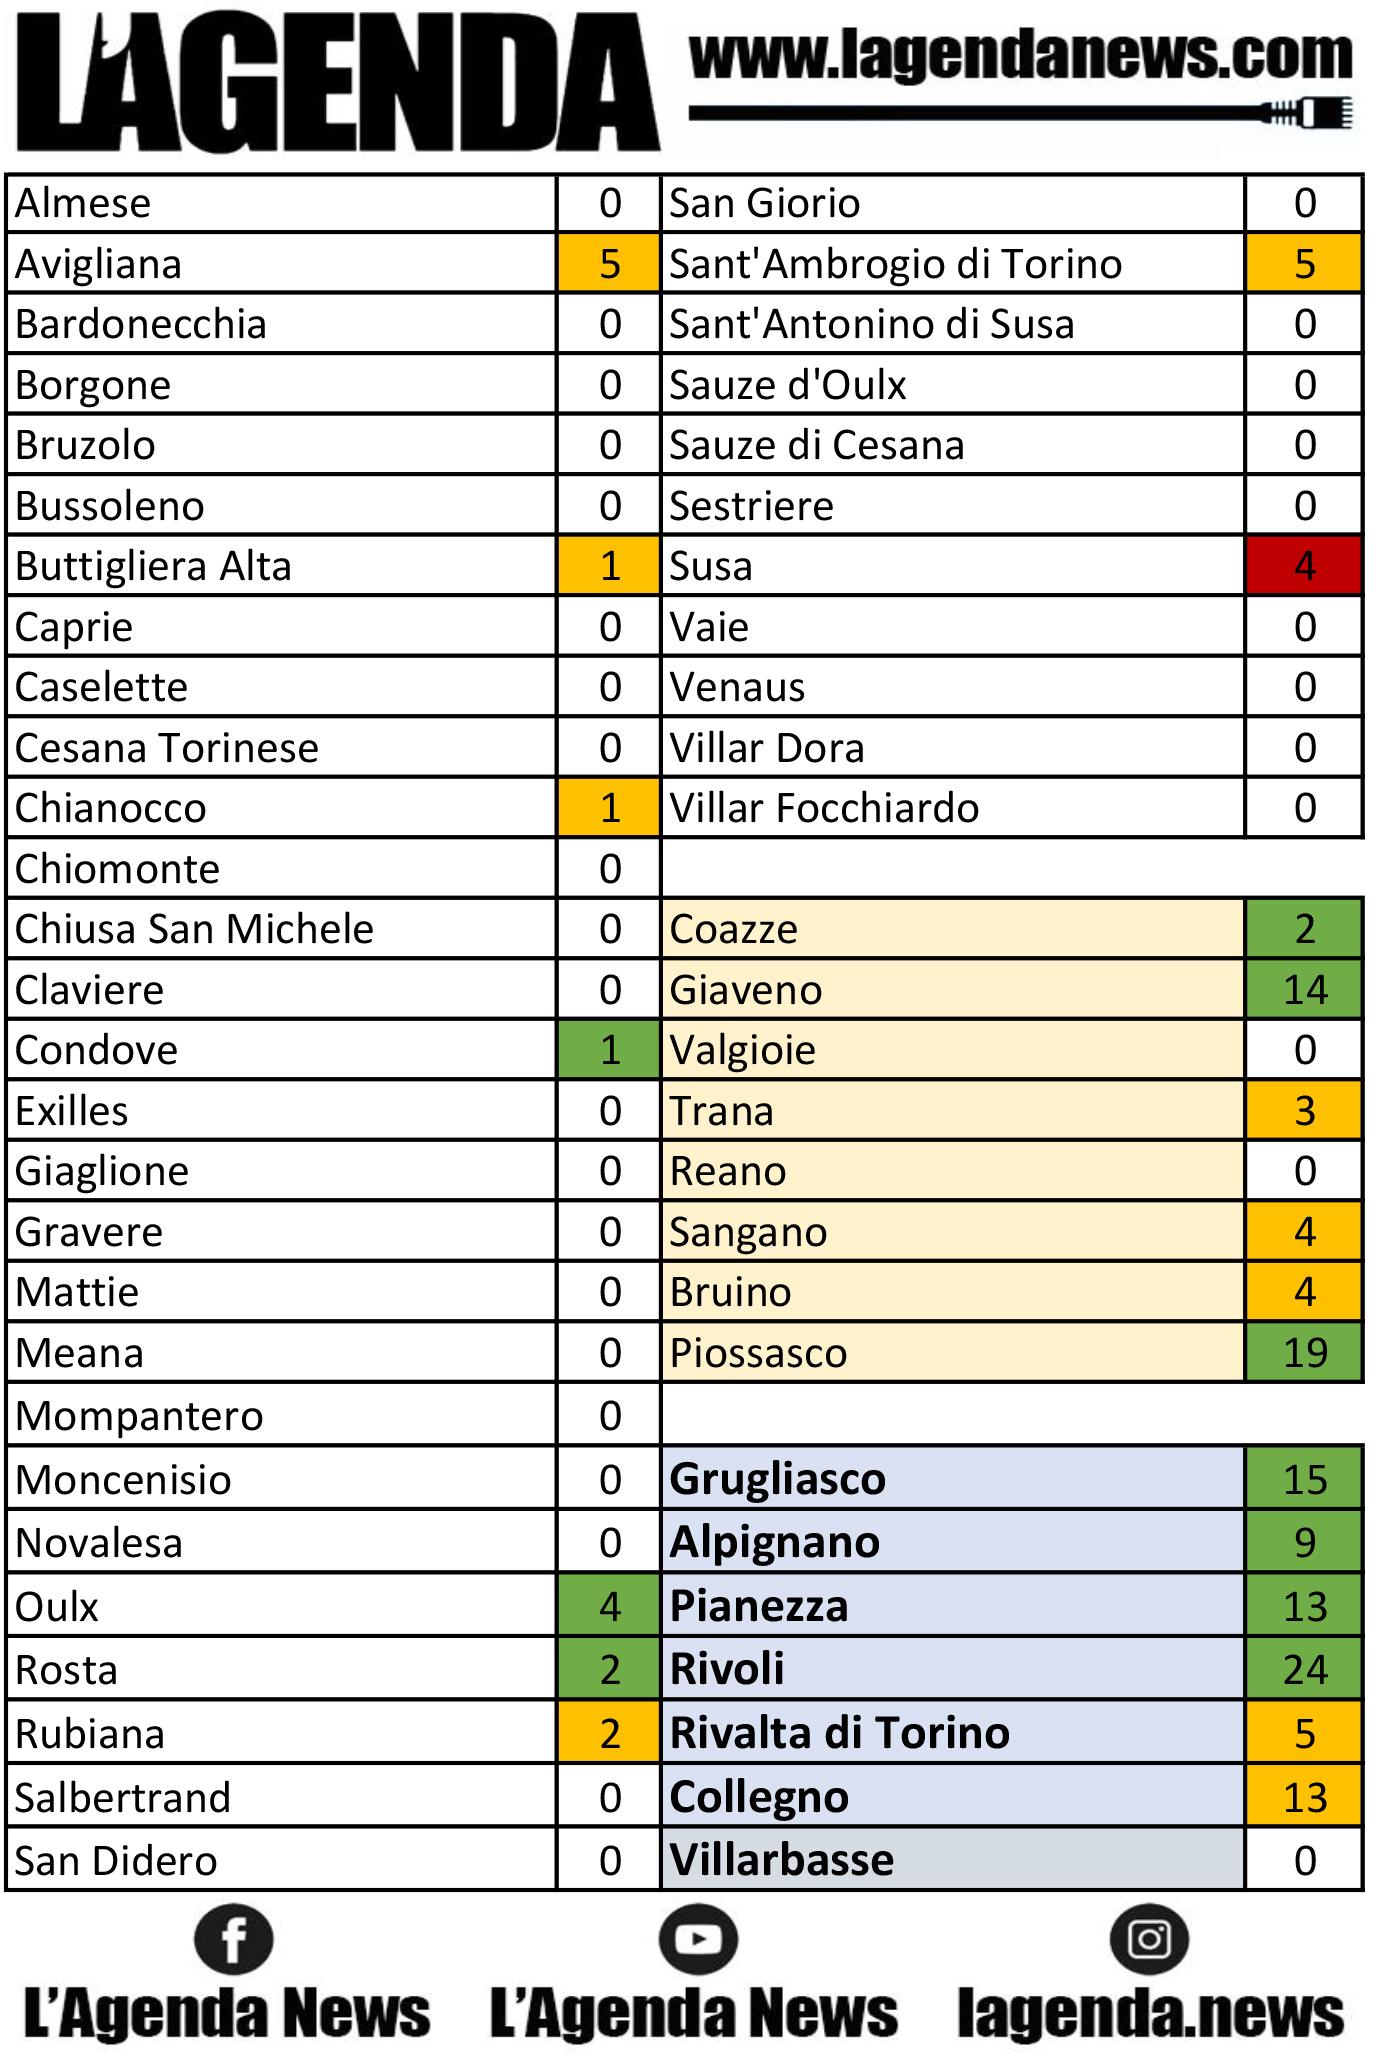 tabella coronavirus 18